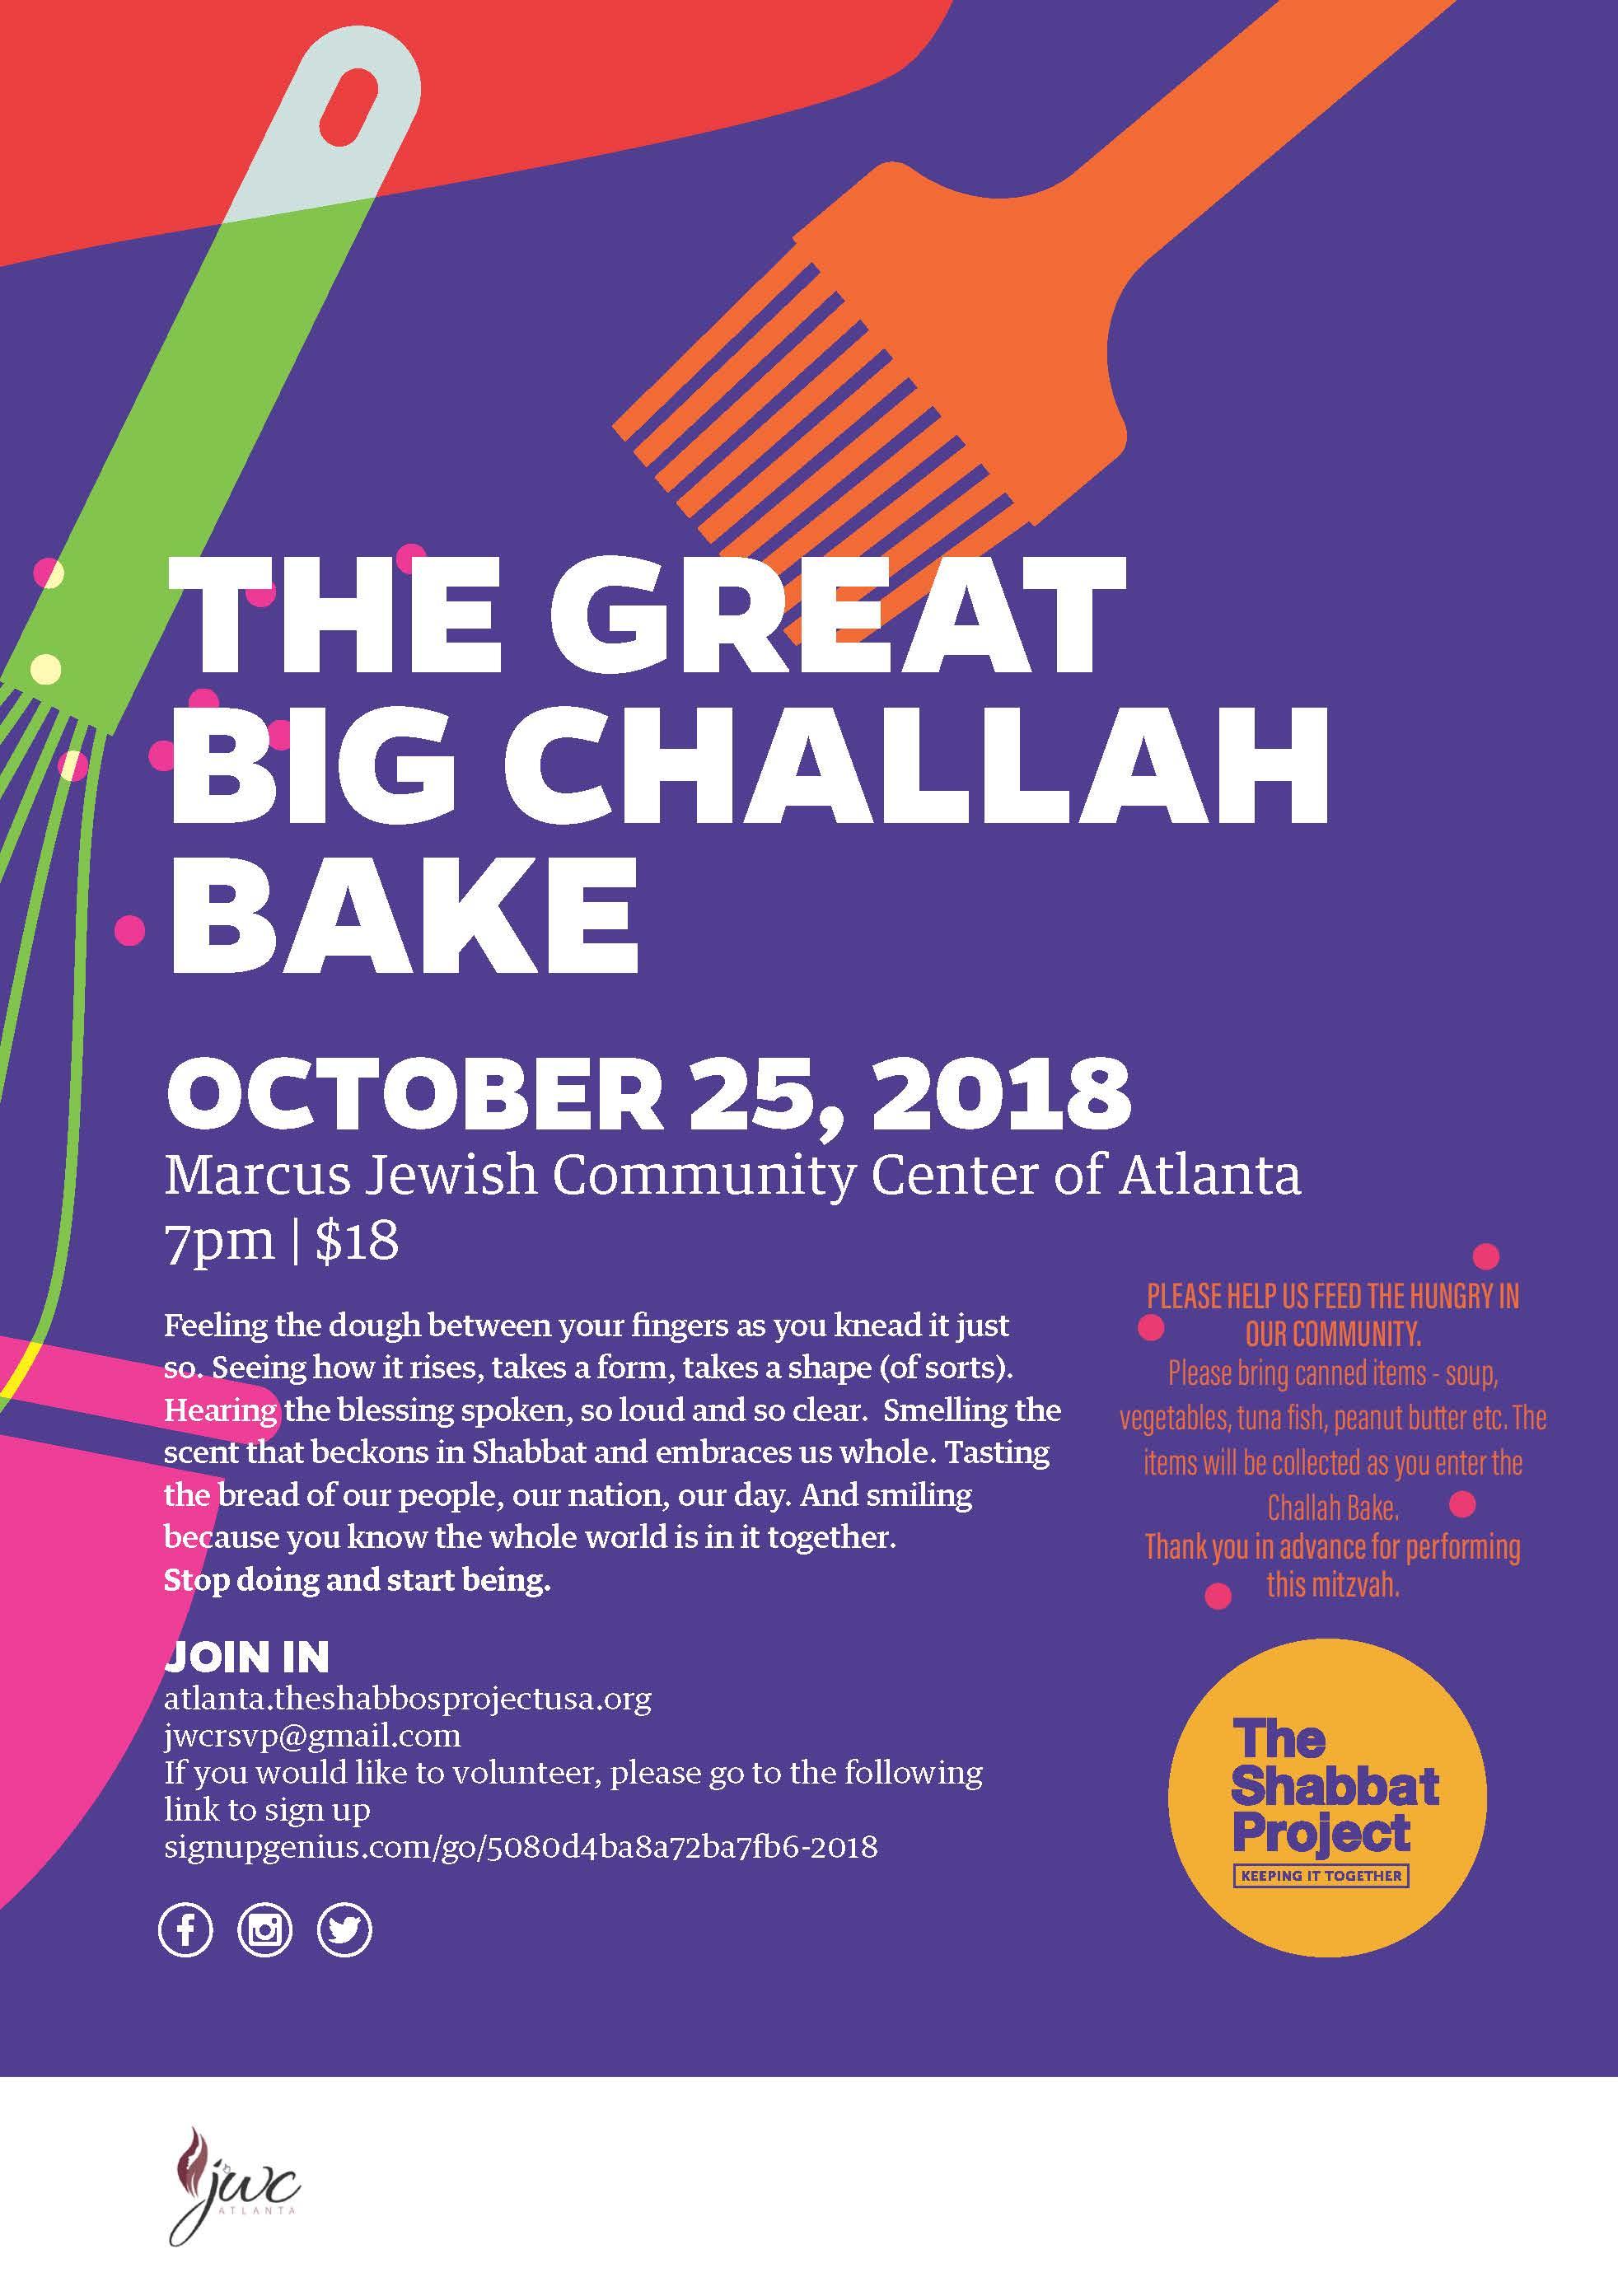 challah bake with new info.jpg